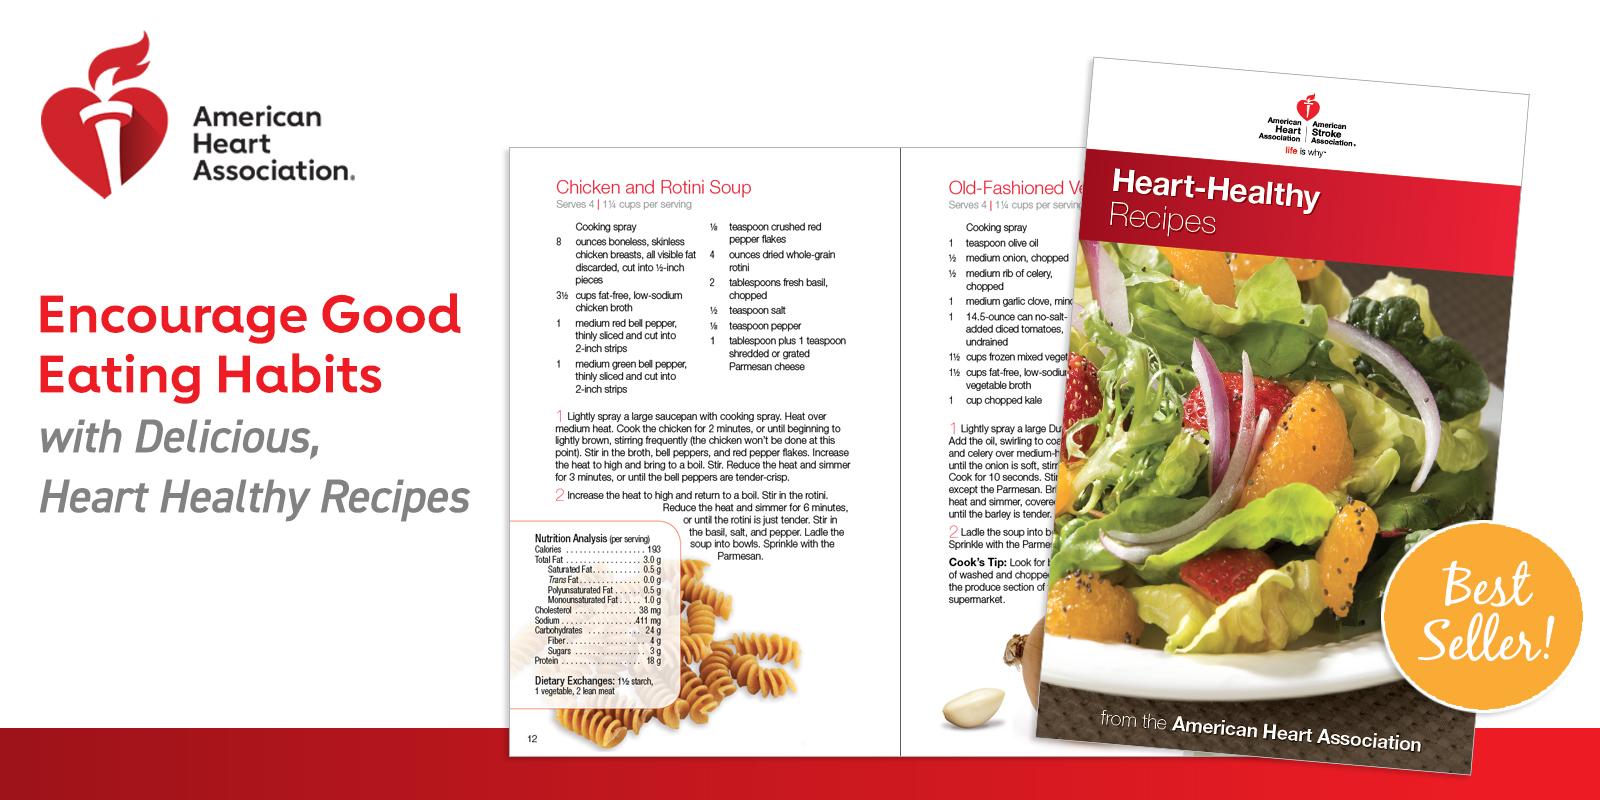 American Heart Association Educational Materials